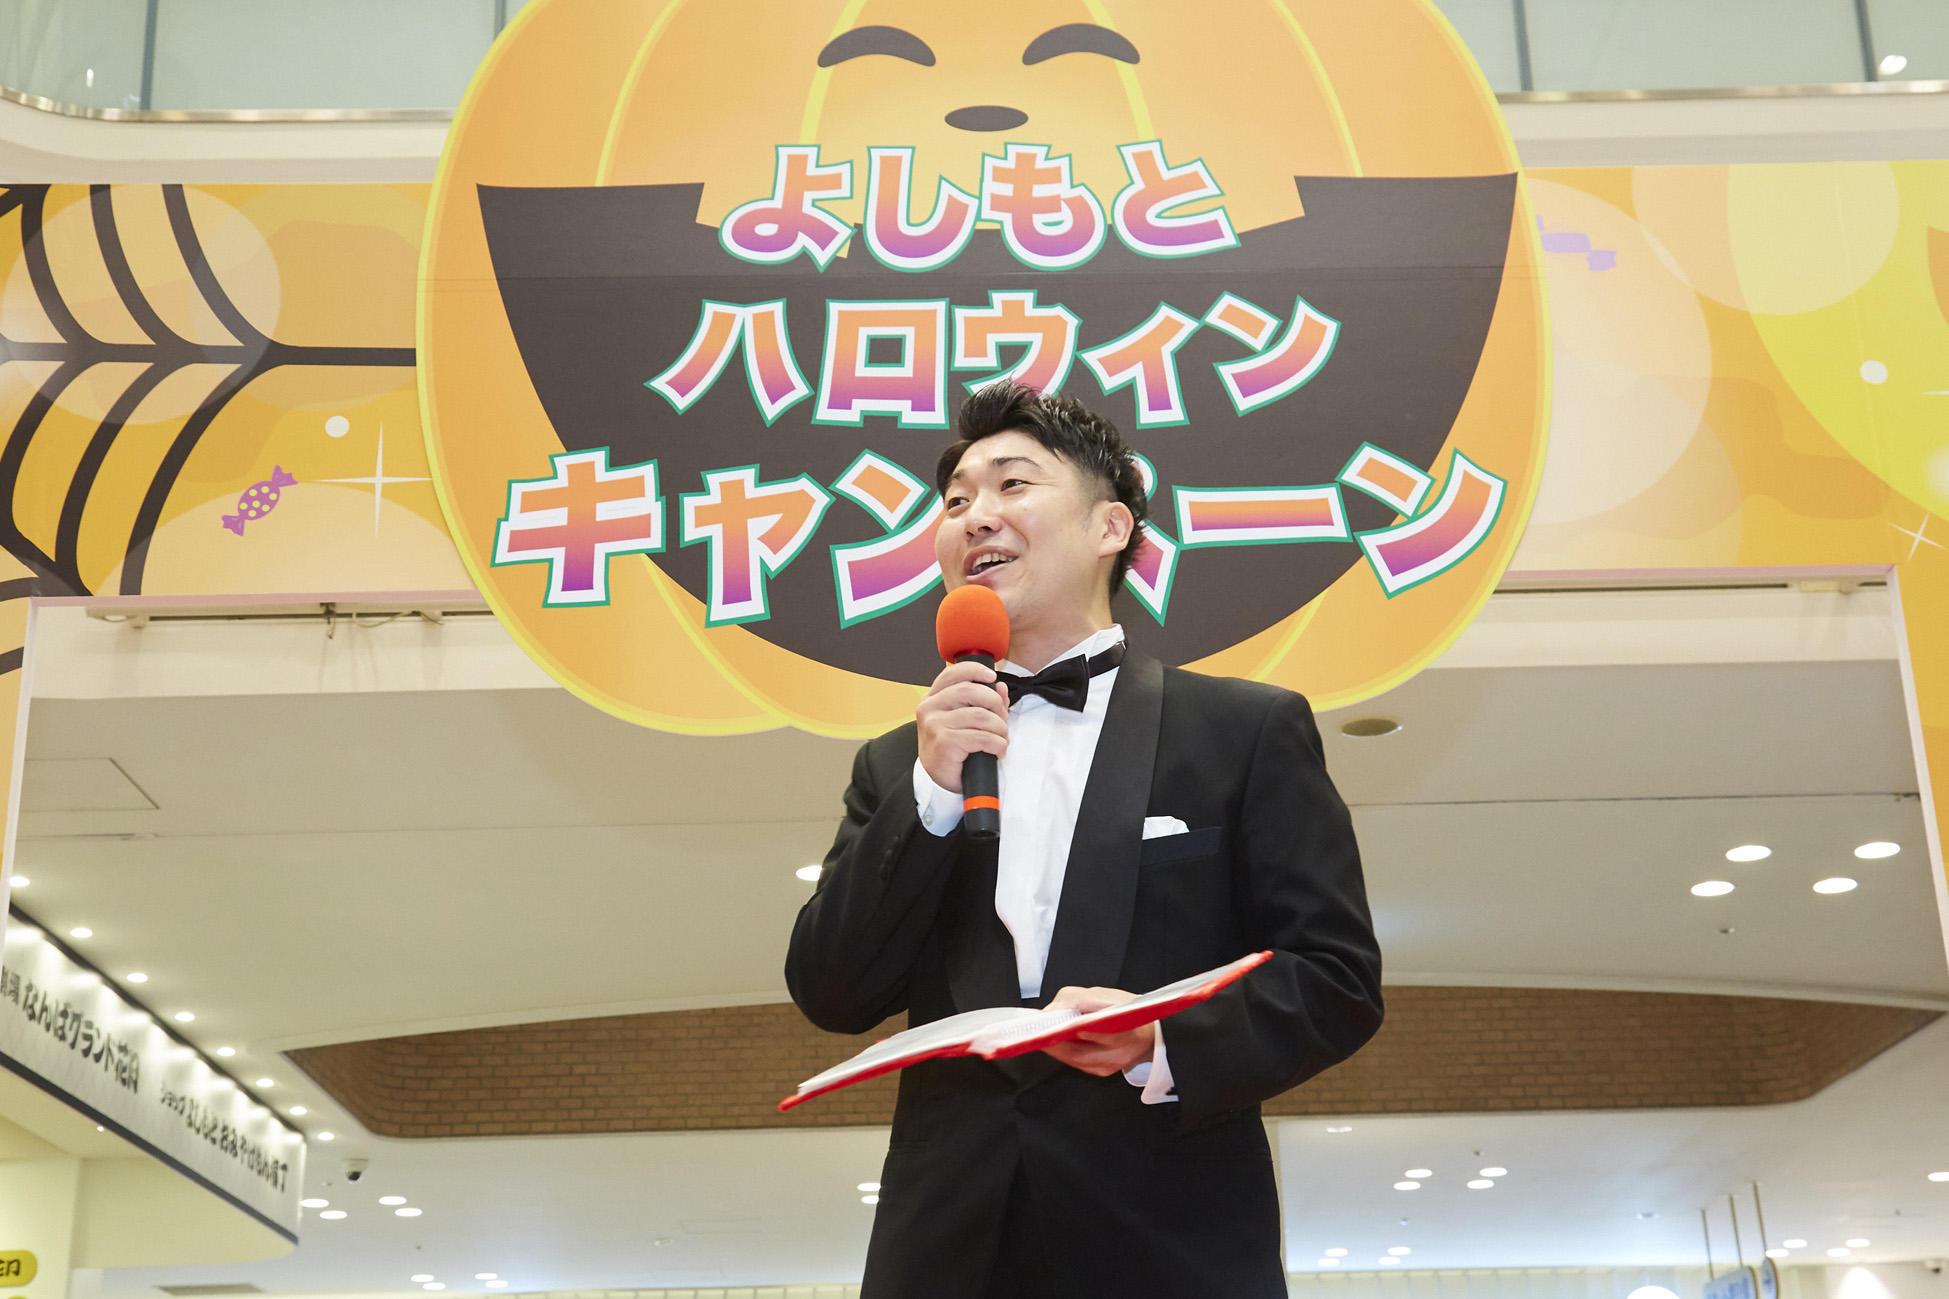 http://news.yoshimoto.co.jp/20180921221224-f71816ef2334924df0bd5b46bfe58147883d7c32.jpg